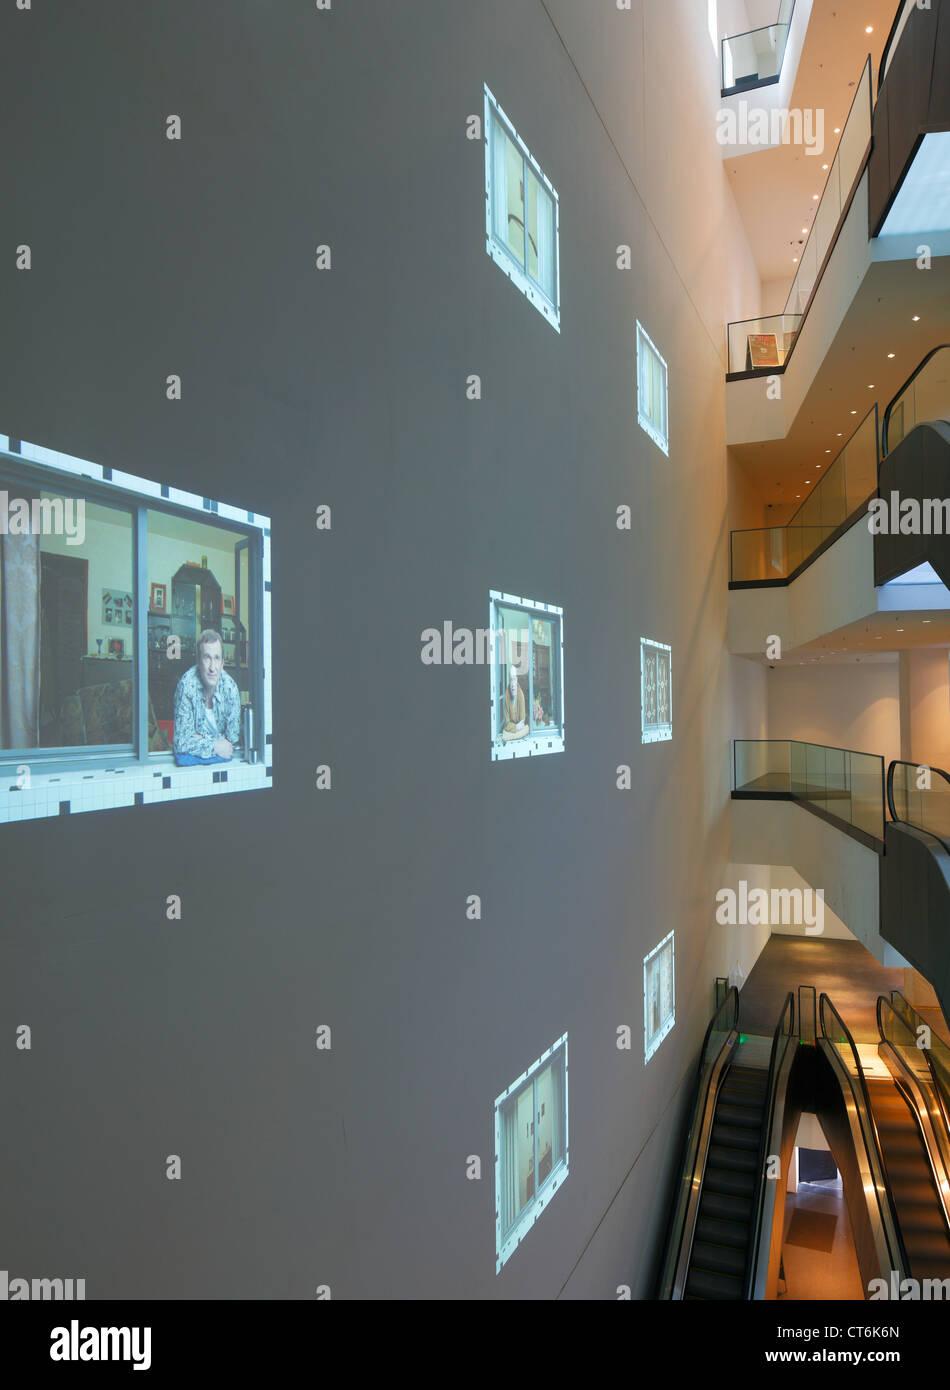 D-Dortmund, Ruhr area, Westphalia, North Rhine-Westphalia, NRW, Dortmunder U, Centre for Art and Creativity, cultural - Stock Image